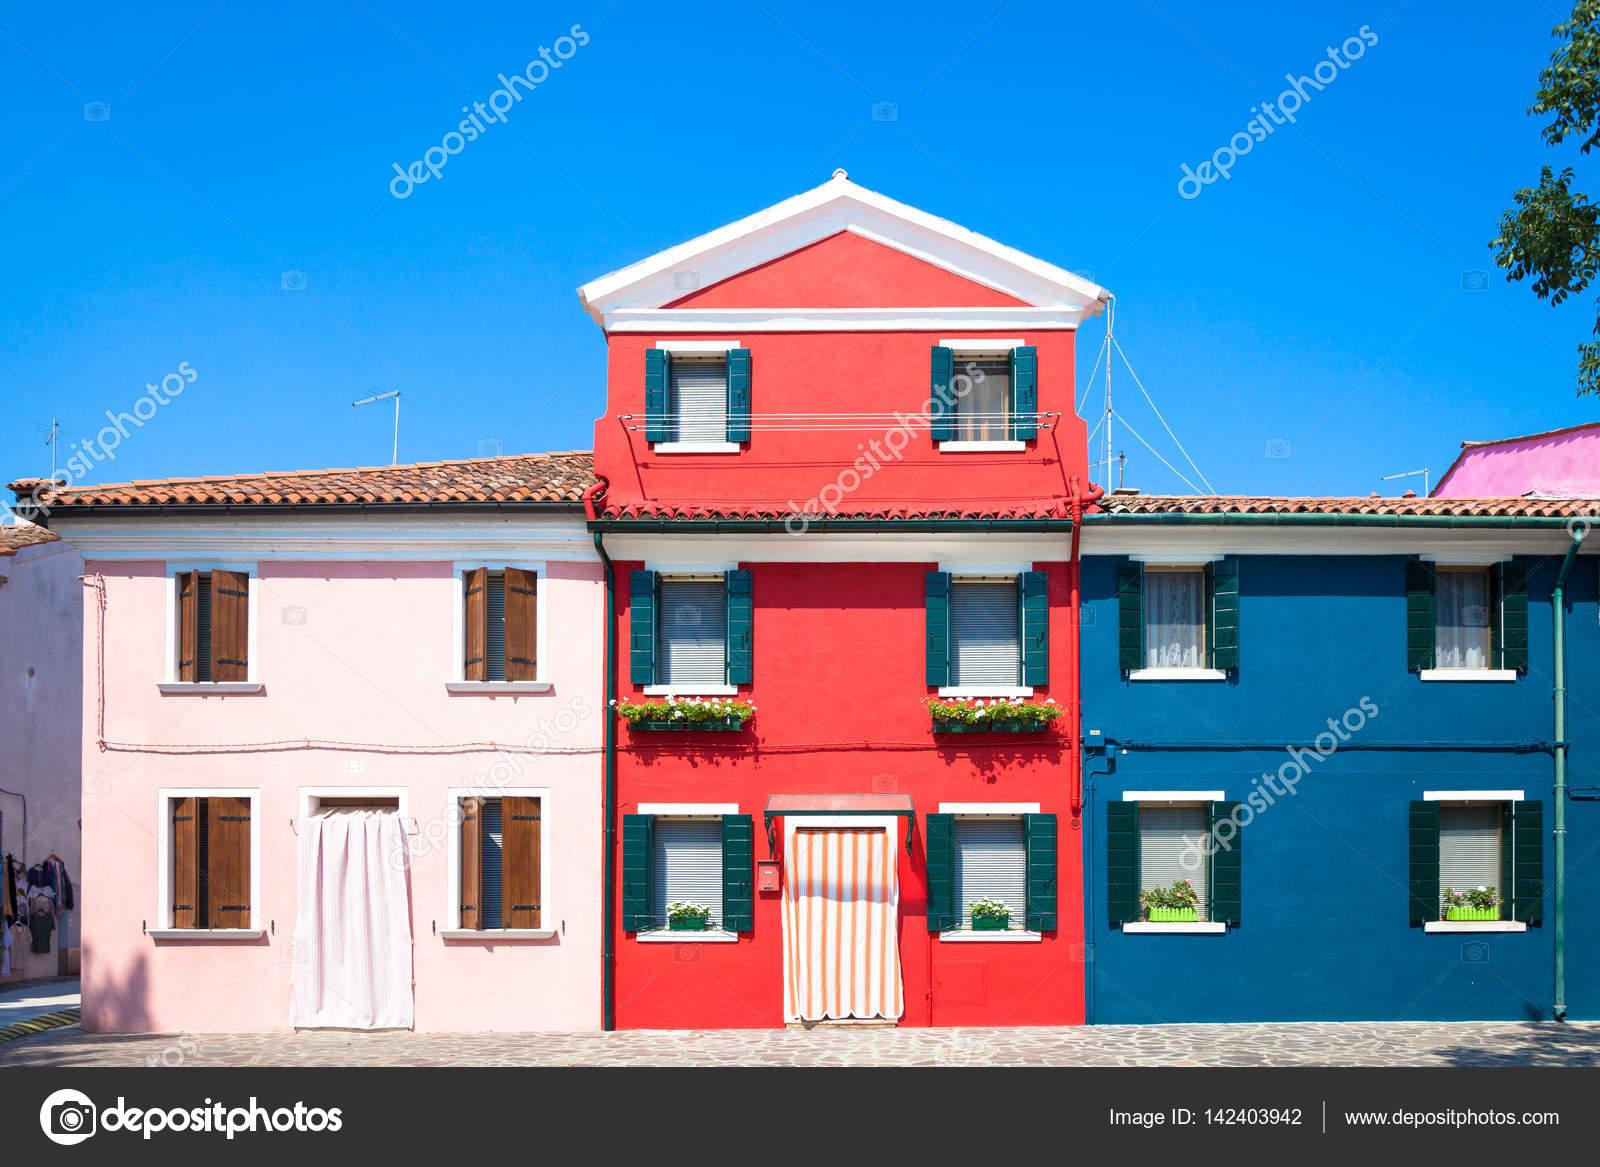 Colores casas en Venecia - Italia — Foto de stock © perseomedusa ...